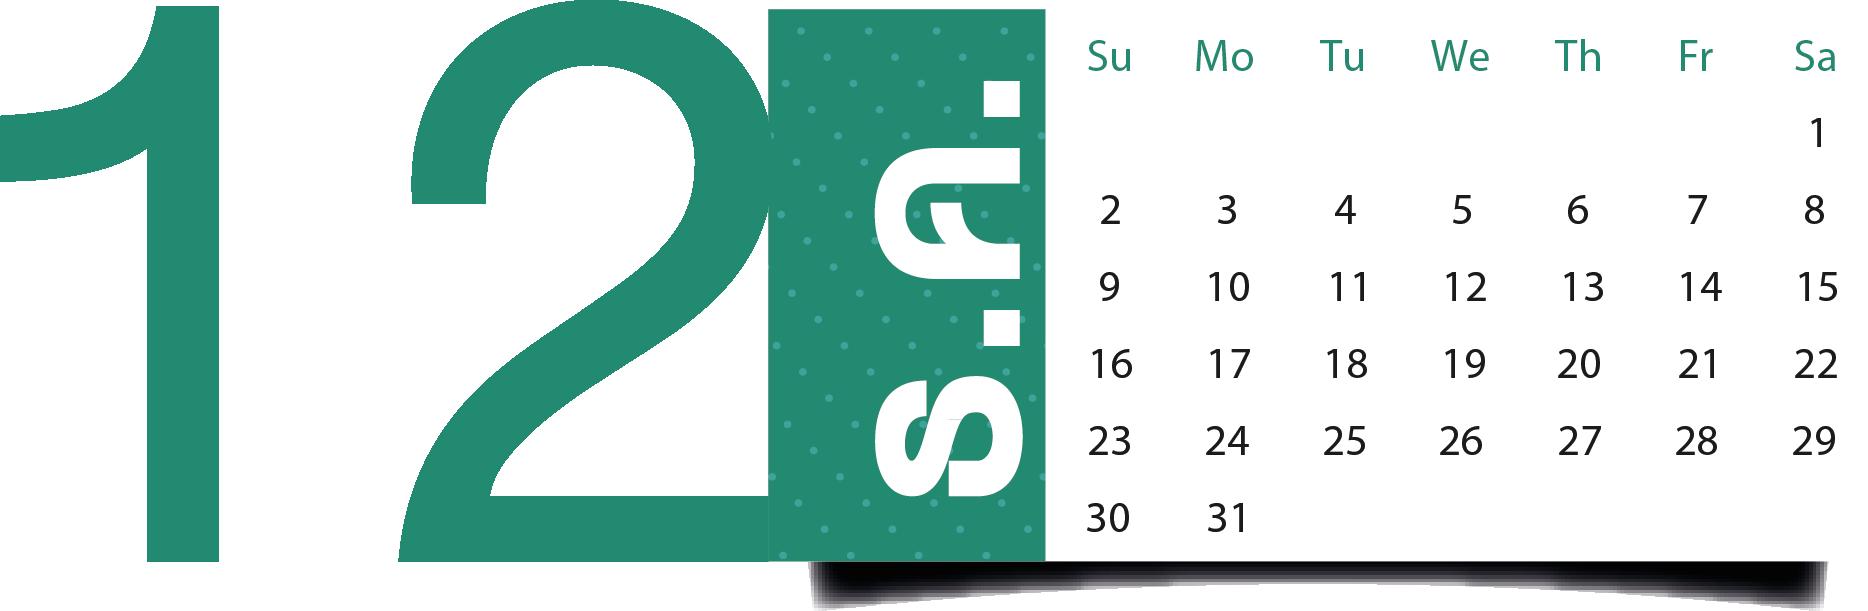 TH_calendar-12